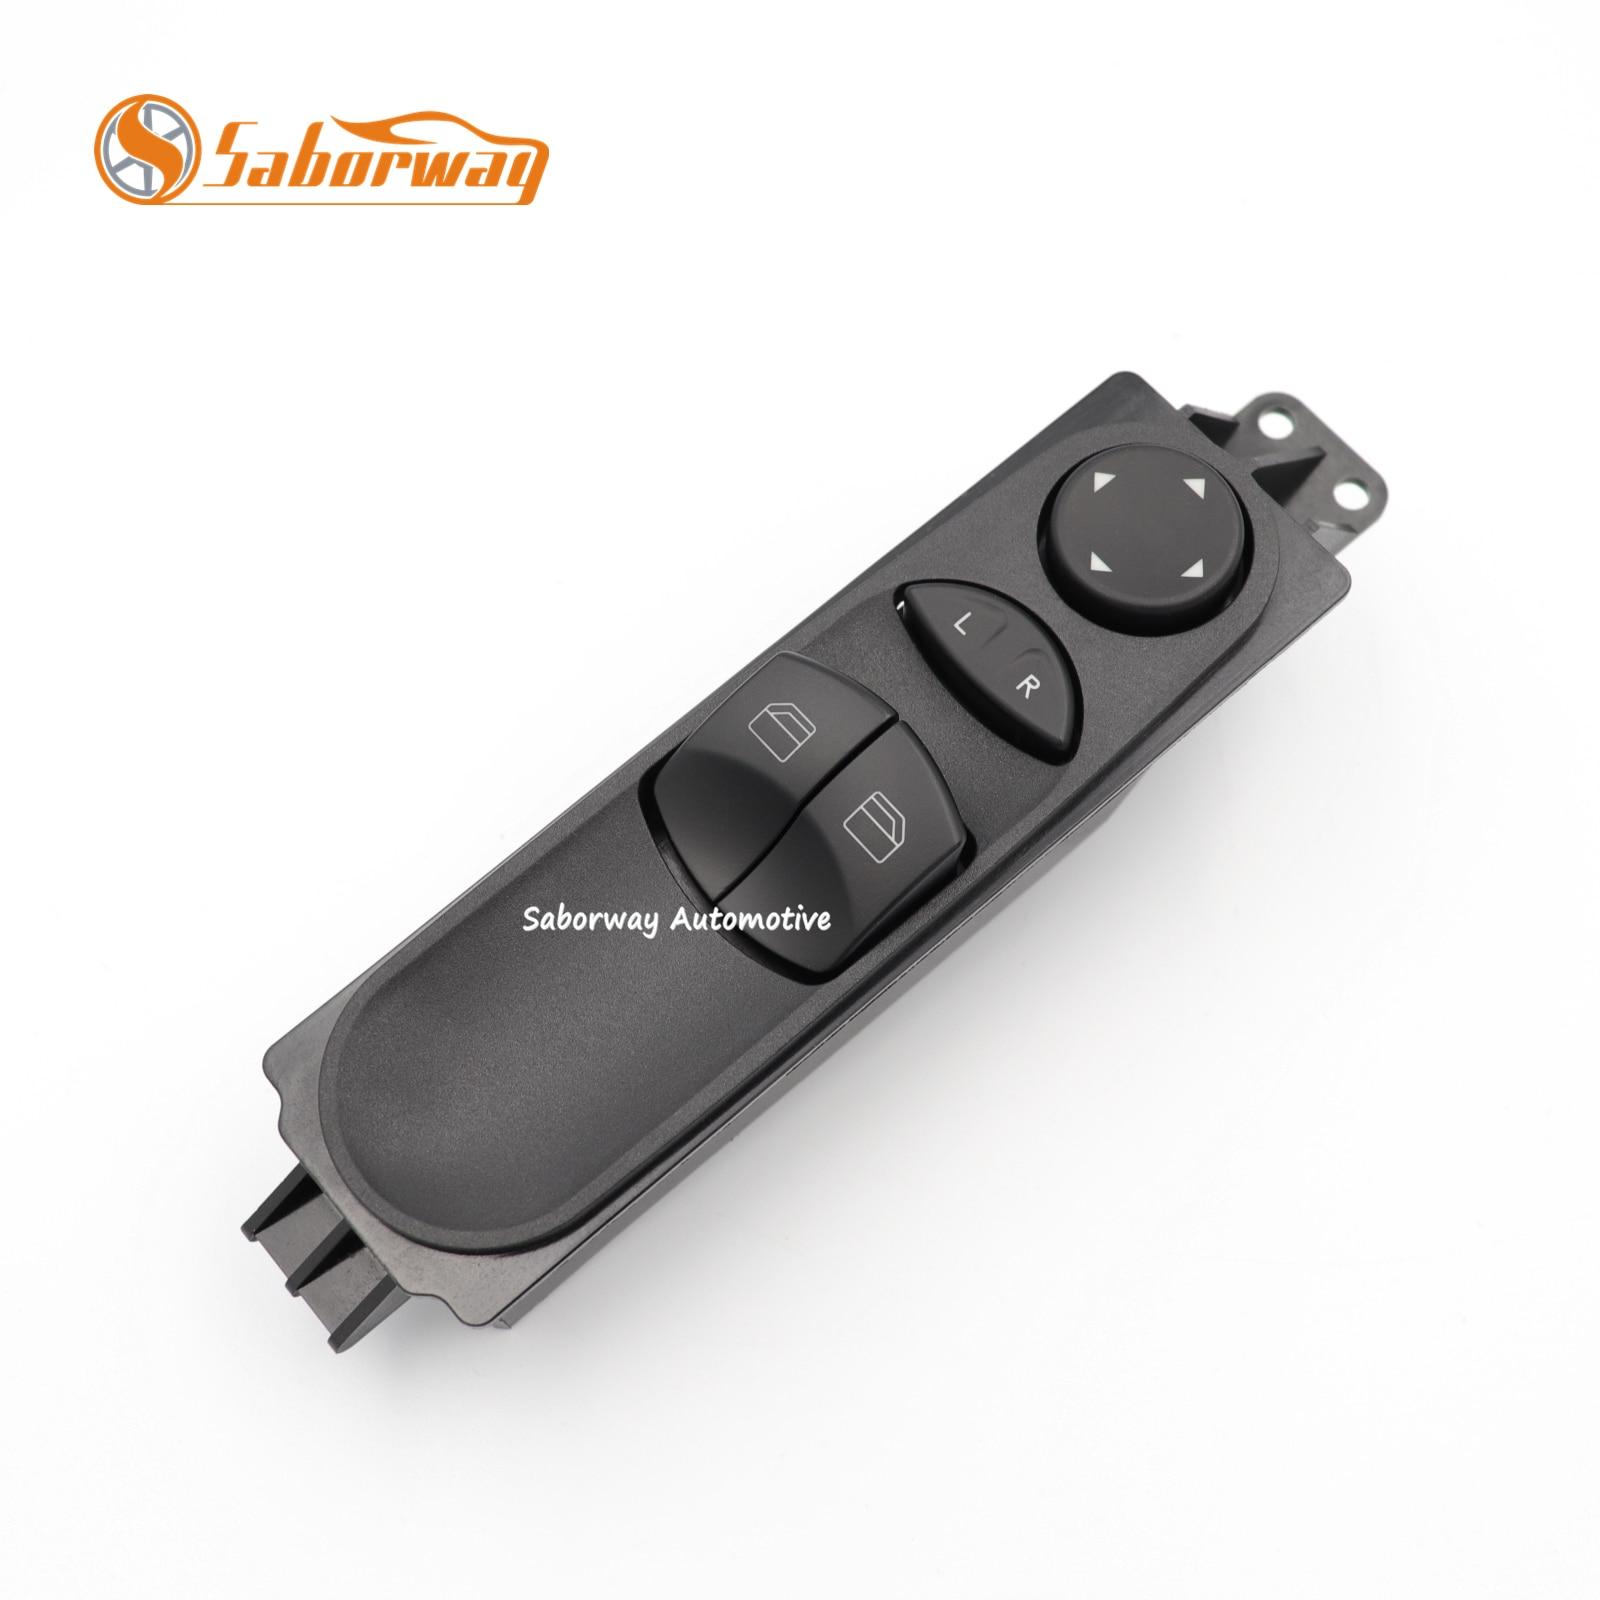 Saborway de ventana principal interruptor de control para Mercedes Sprinter W906 A906 545 1213 A9065451213